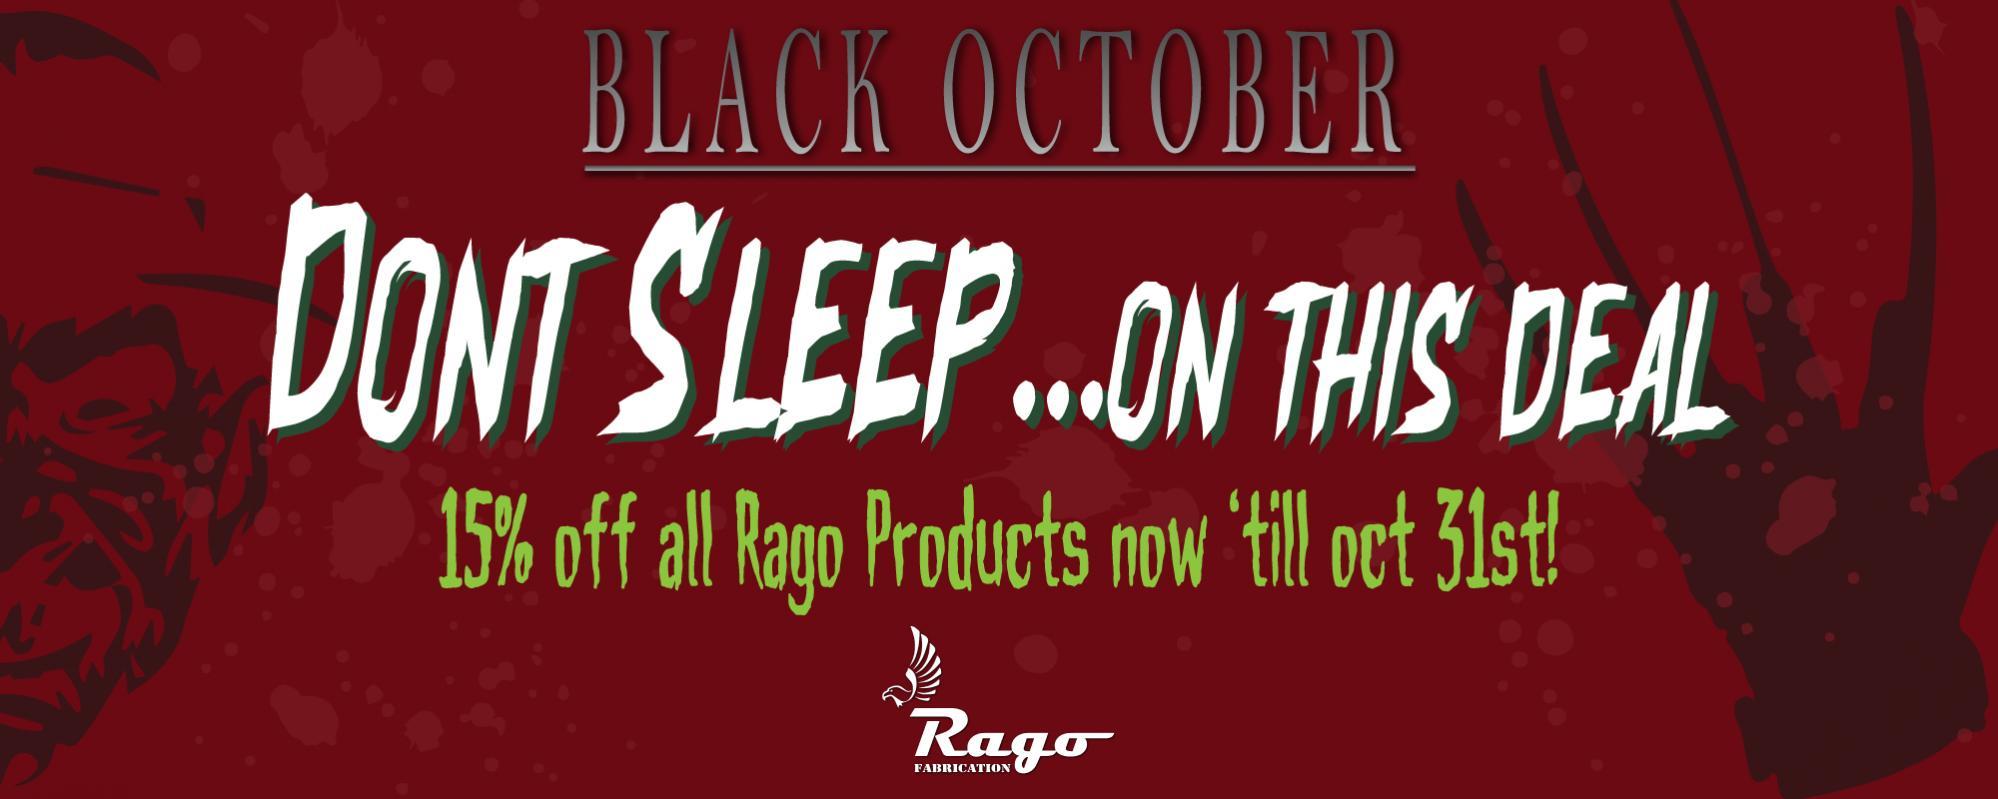 Black october is here!!!-blackoct_banner_5-jpg